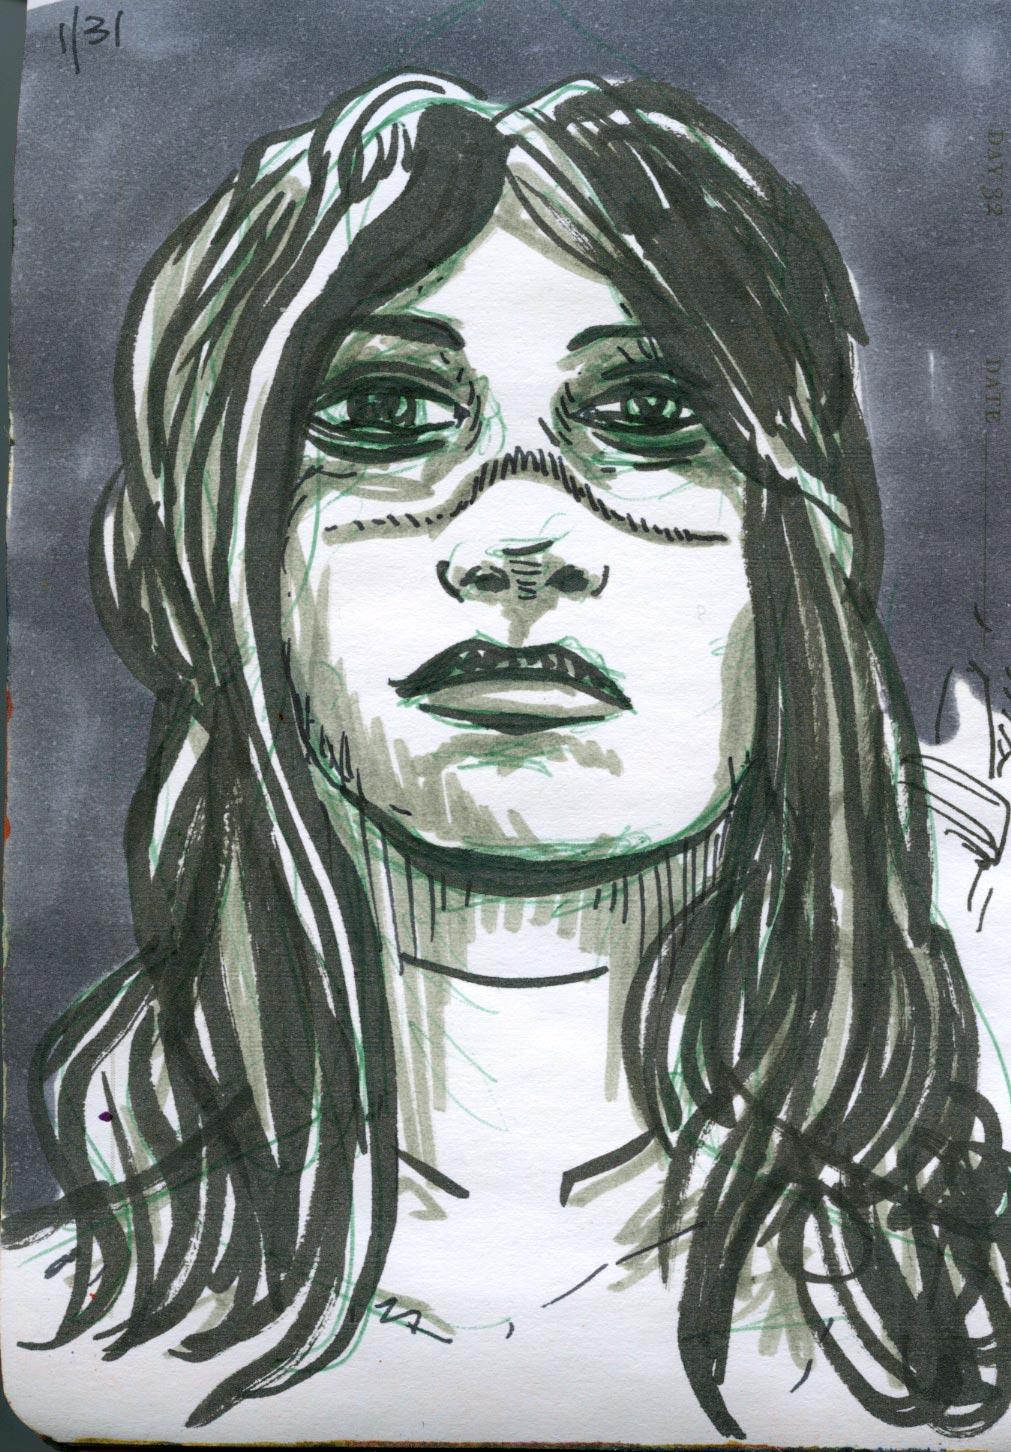 FWACATA-Sketchbook-319